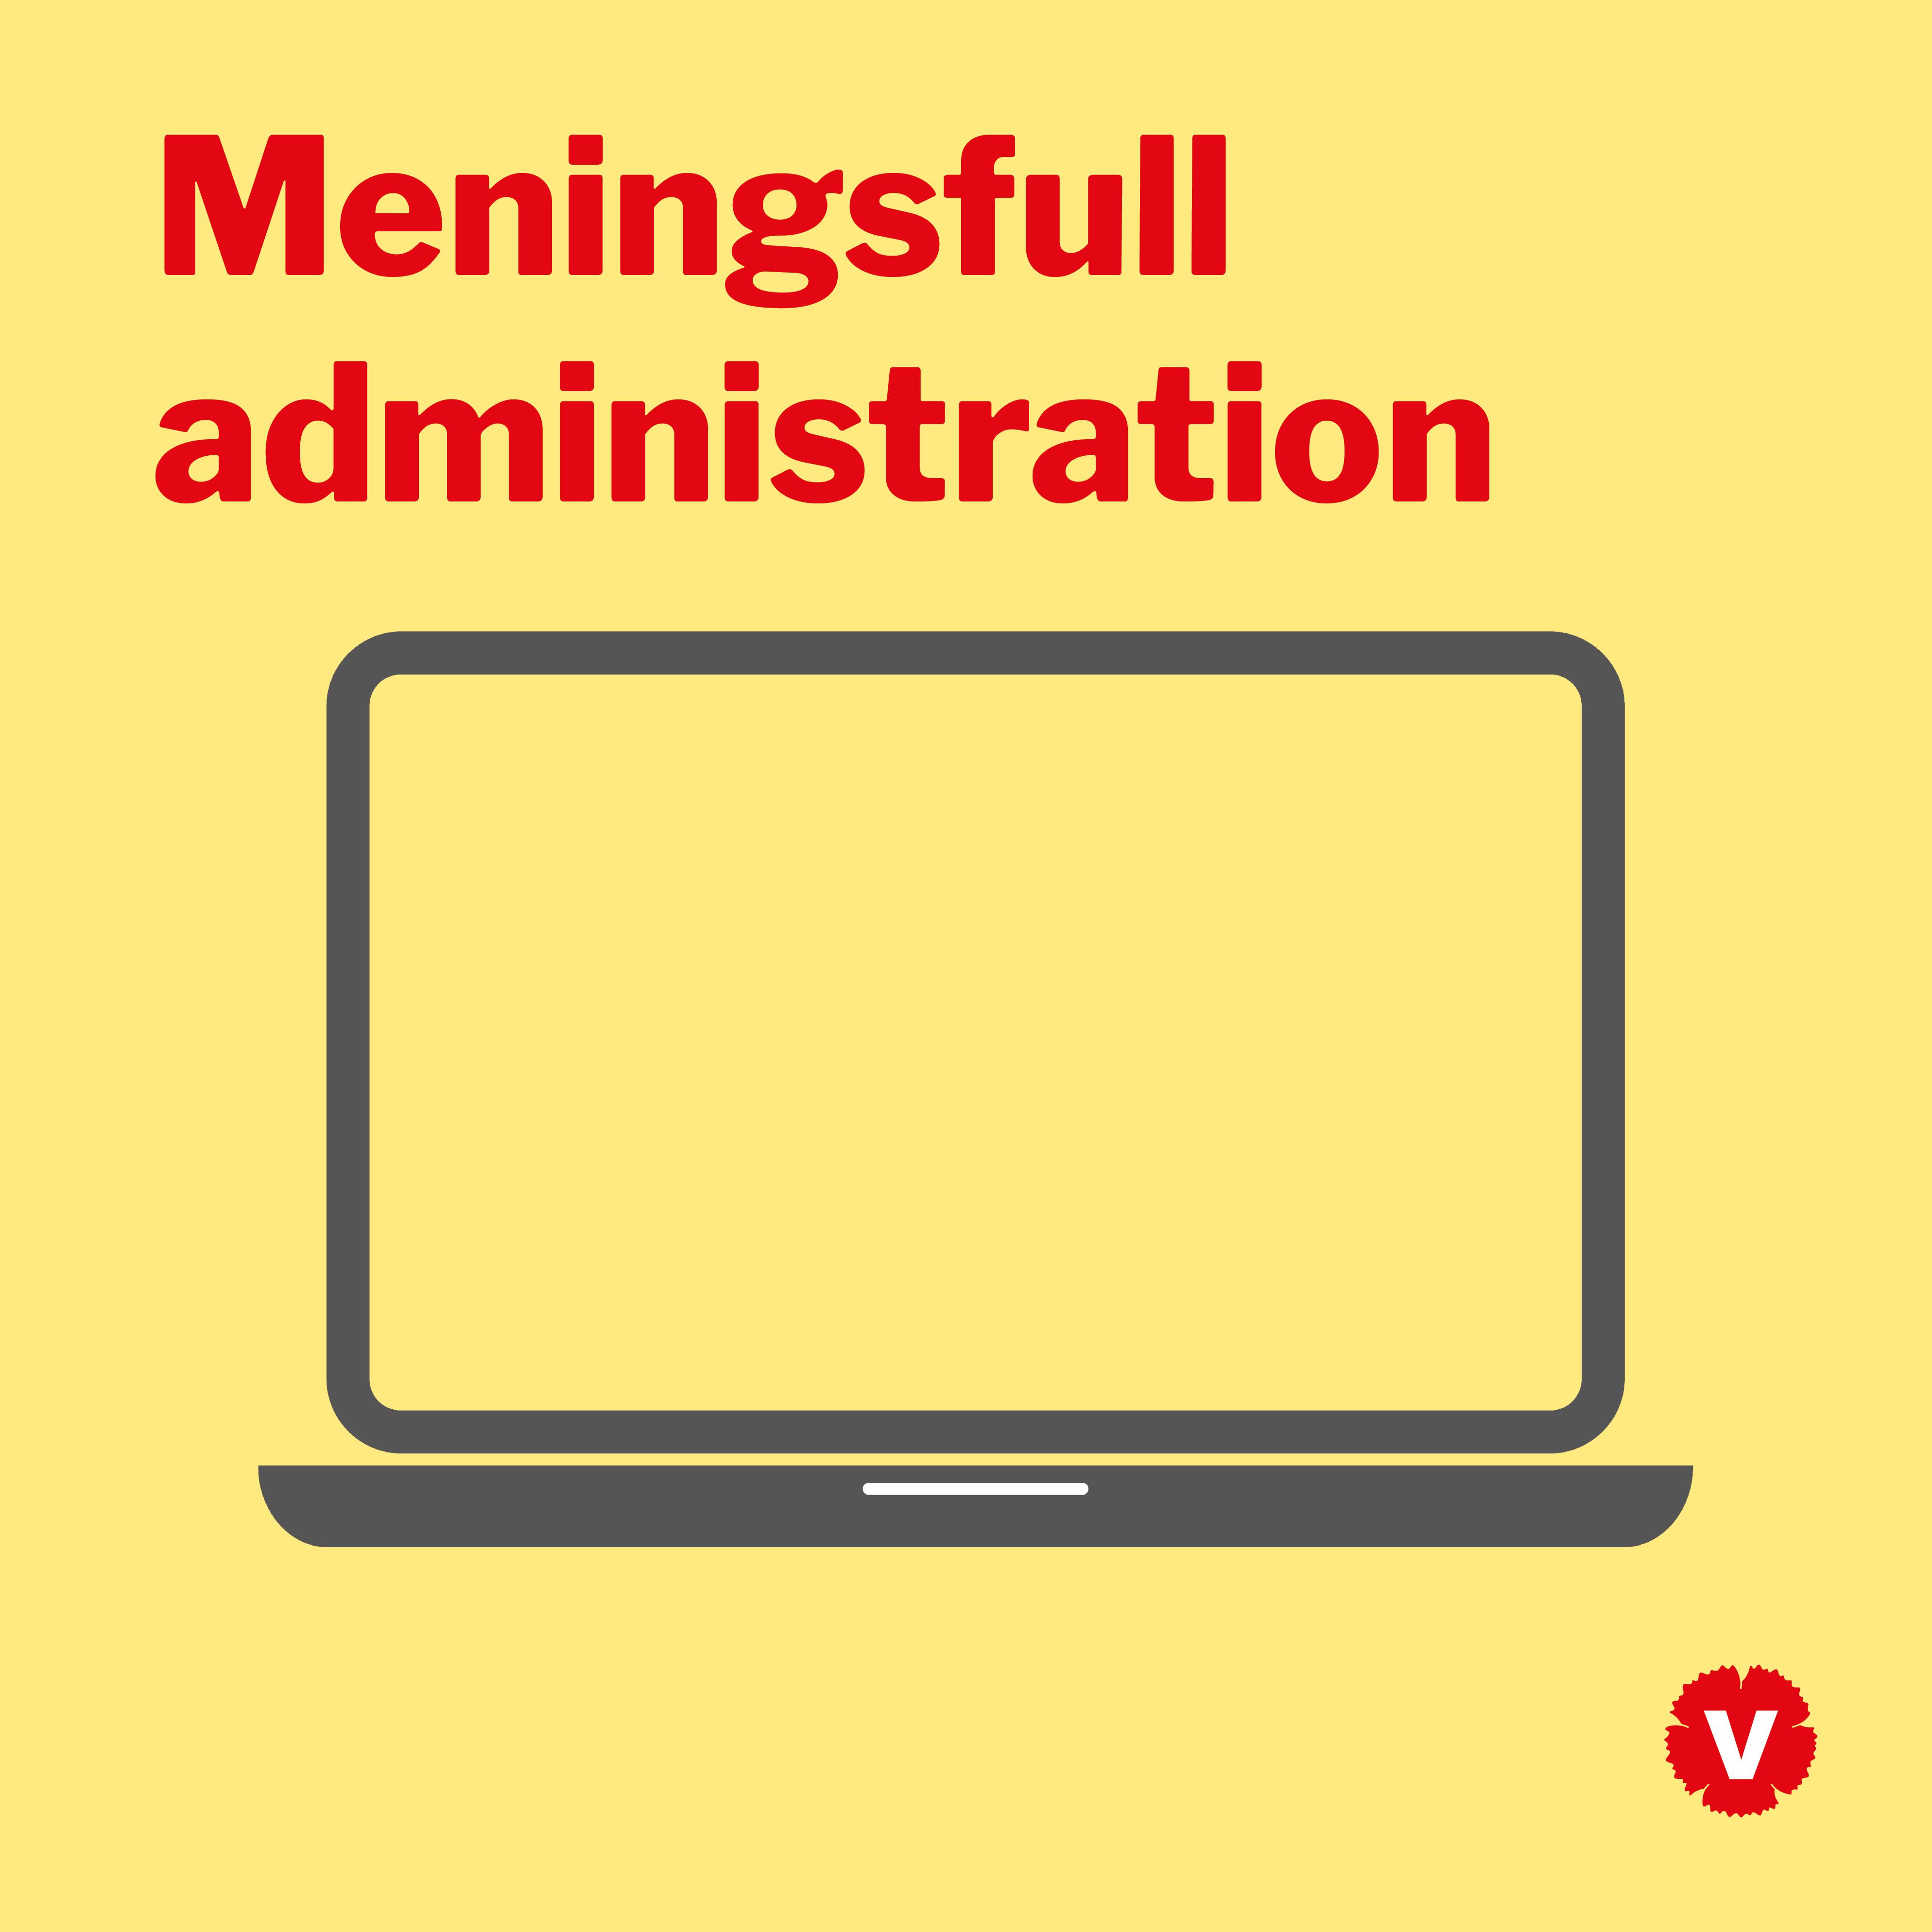 Meningsfull administration